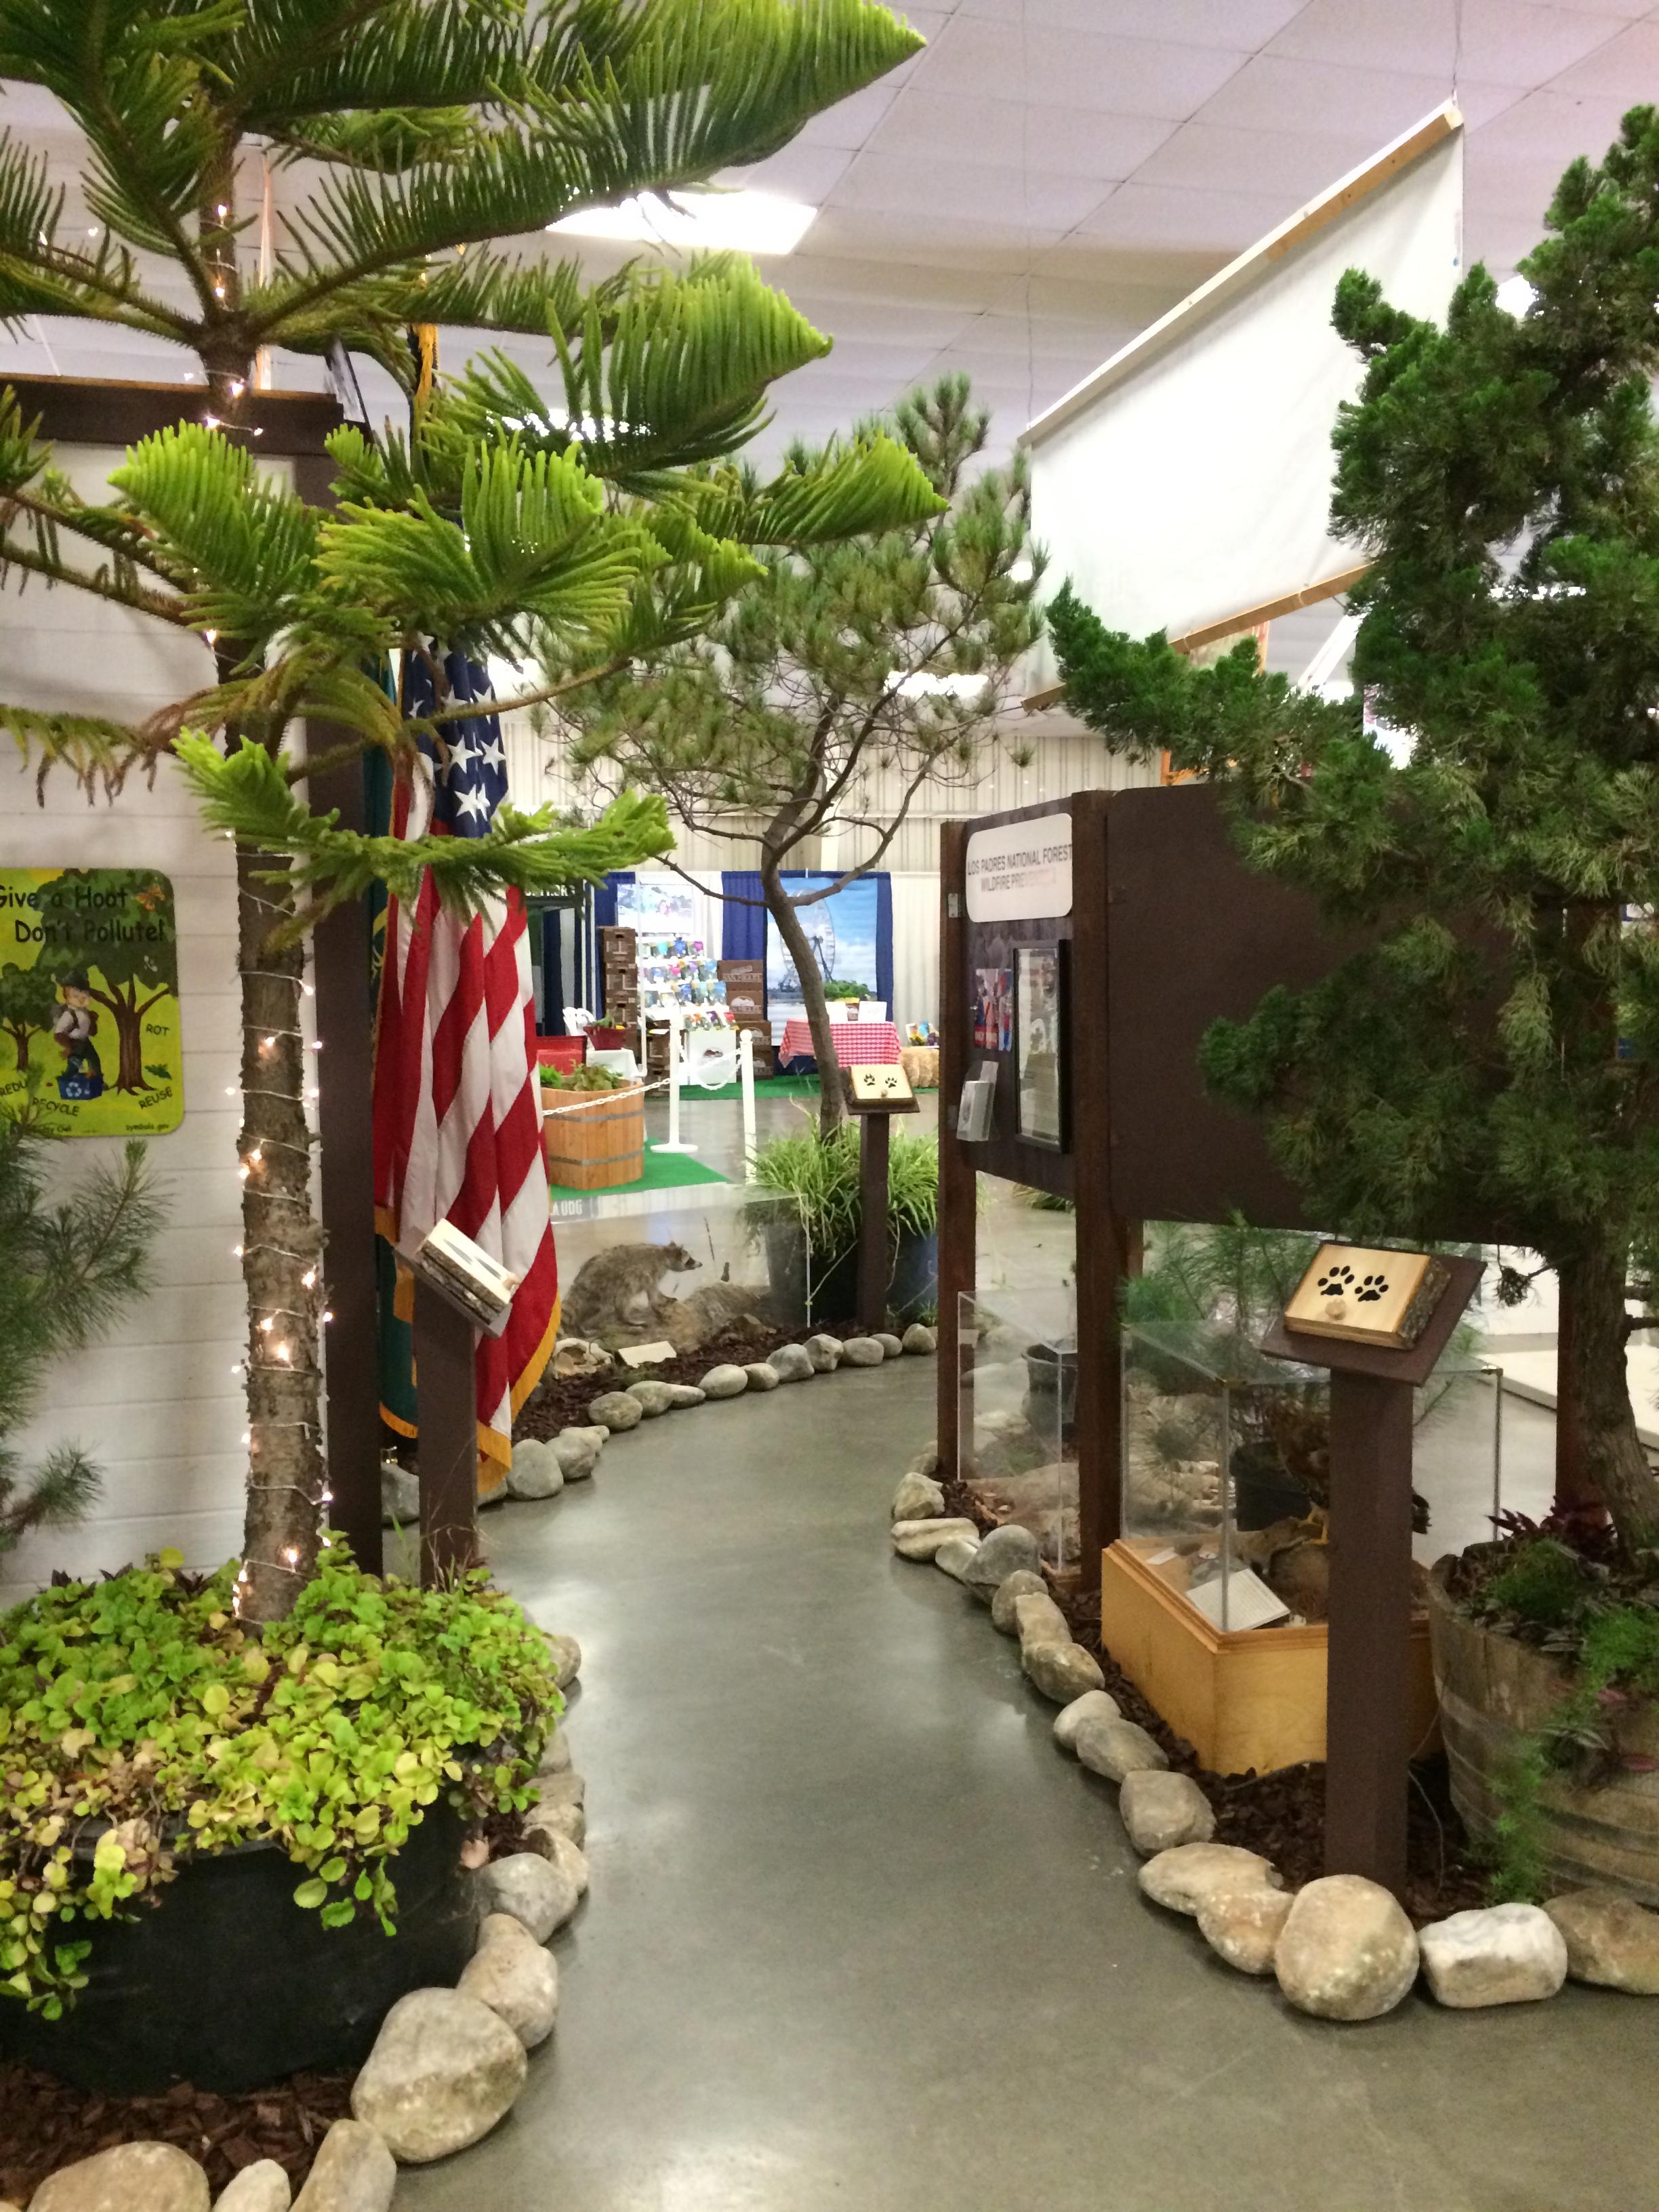 Superieur ... Ventura County Fair Exhibit